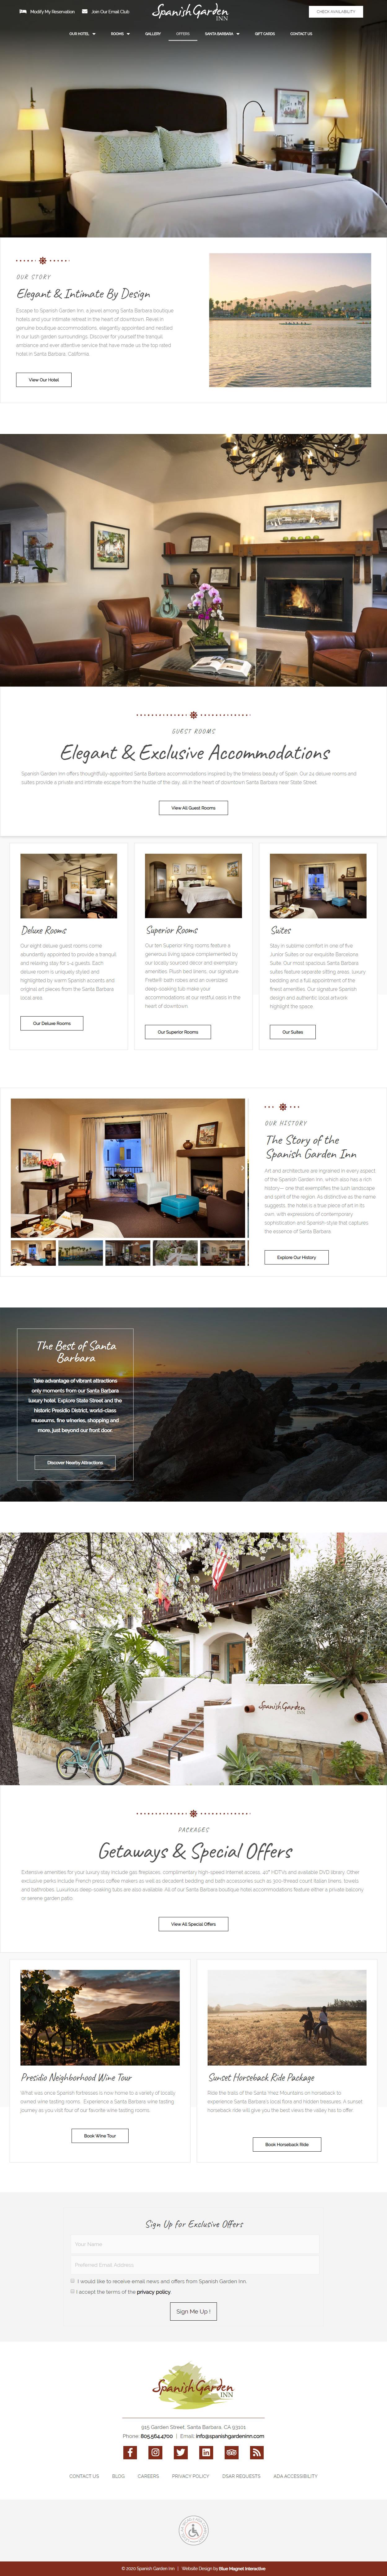 web design example spanish garden inn